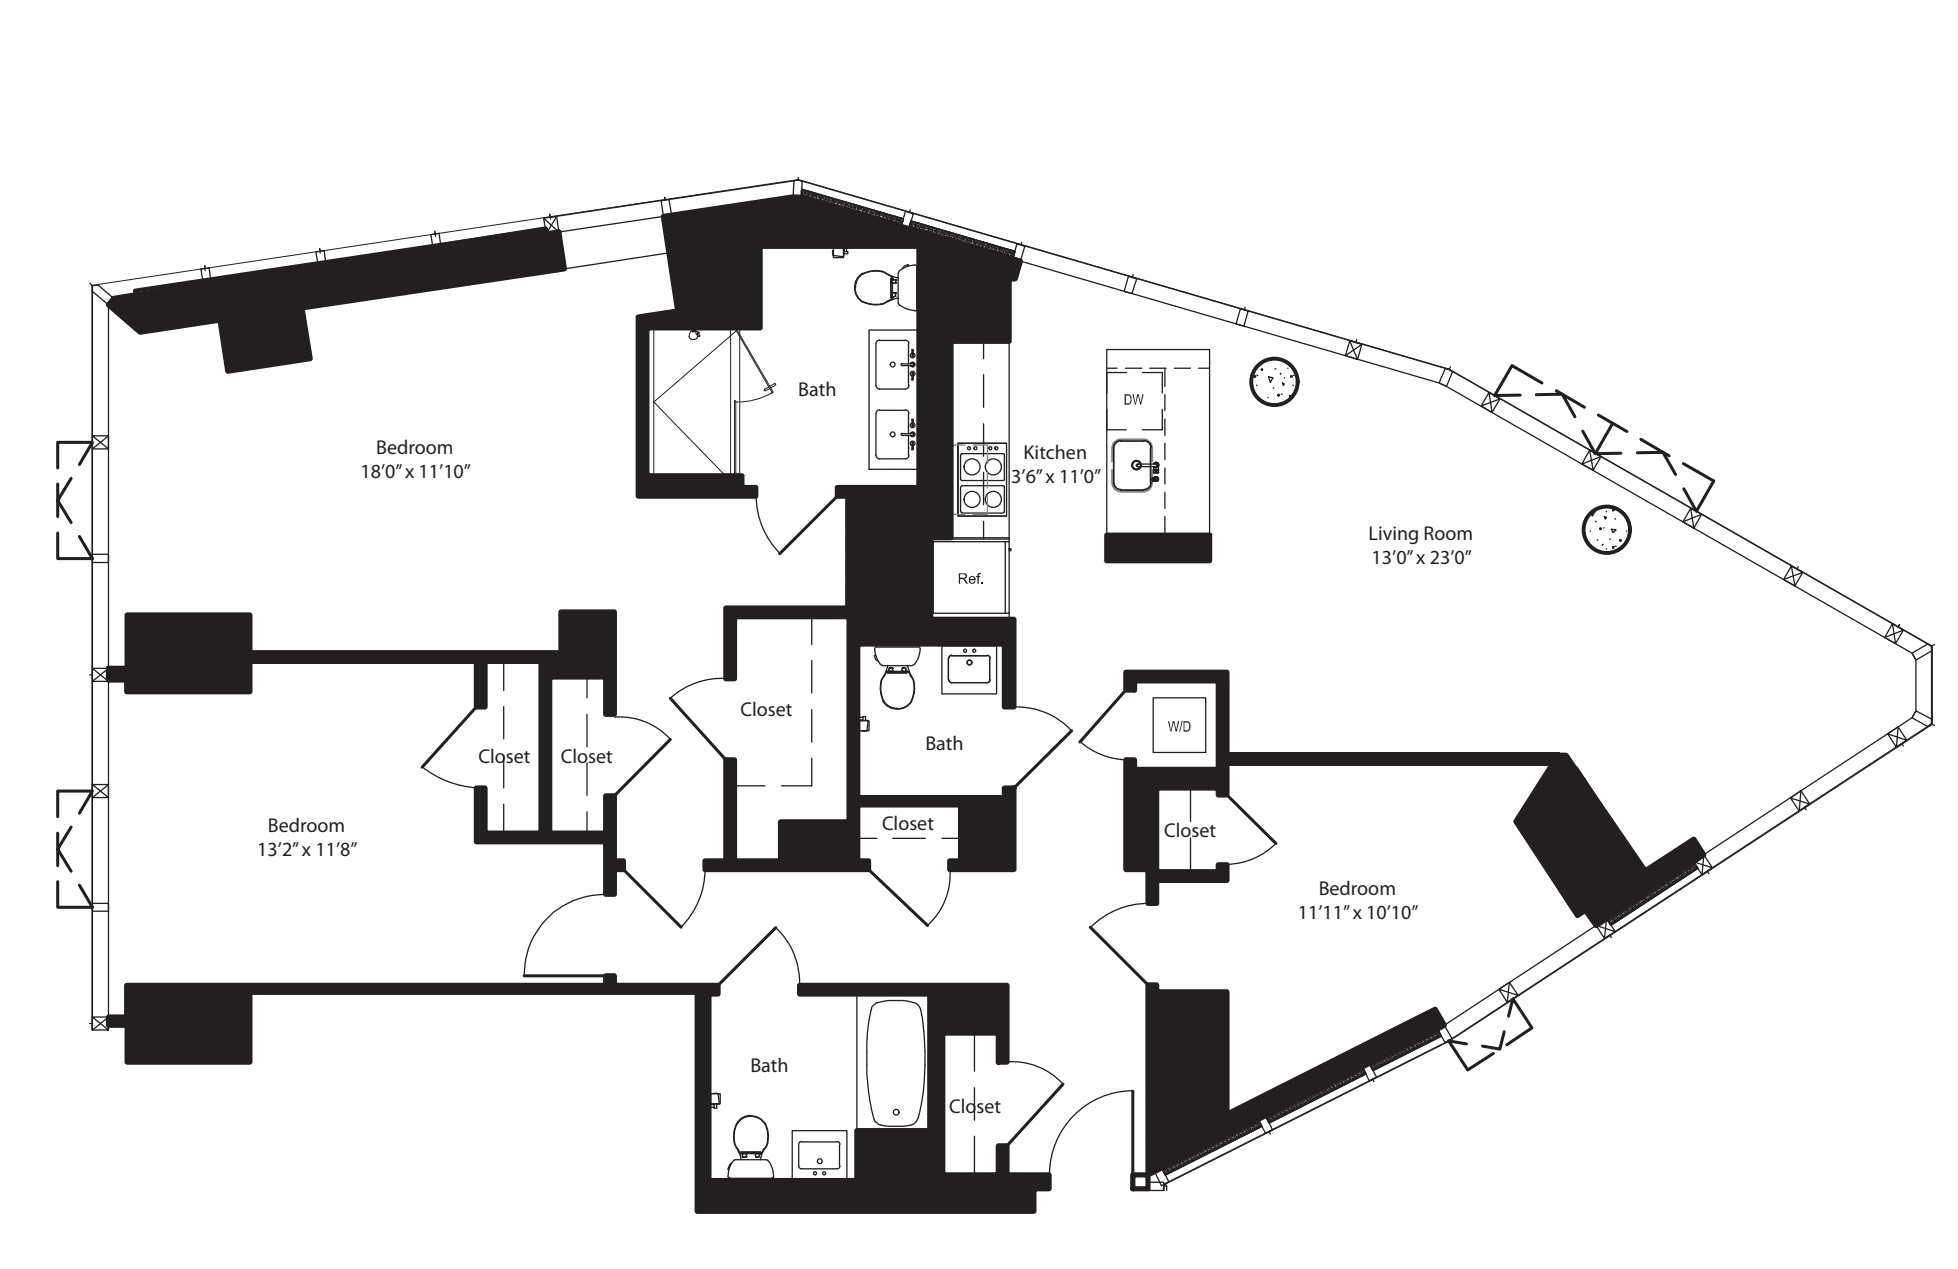 Three Bedroom I 20, H 21-22